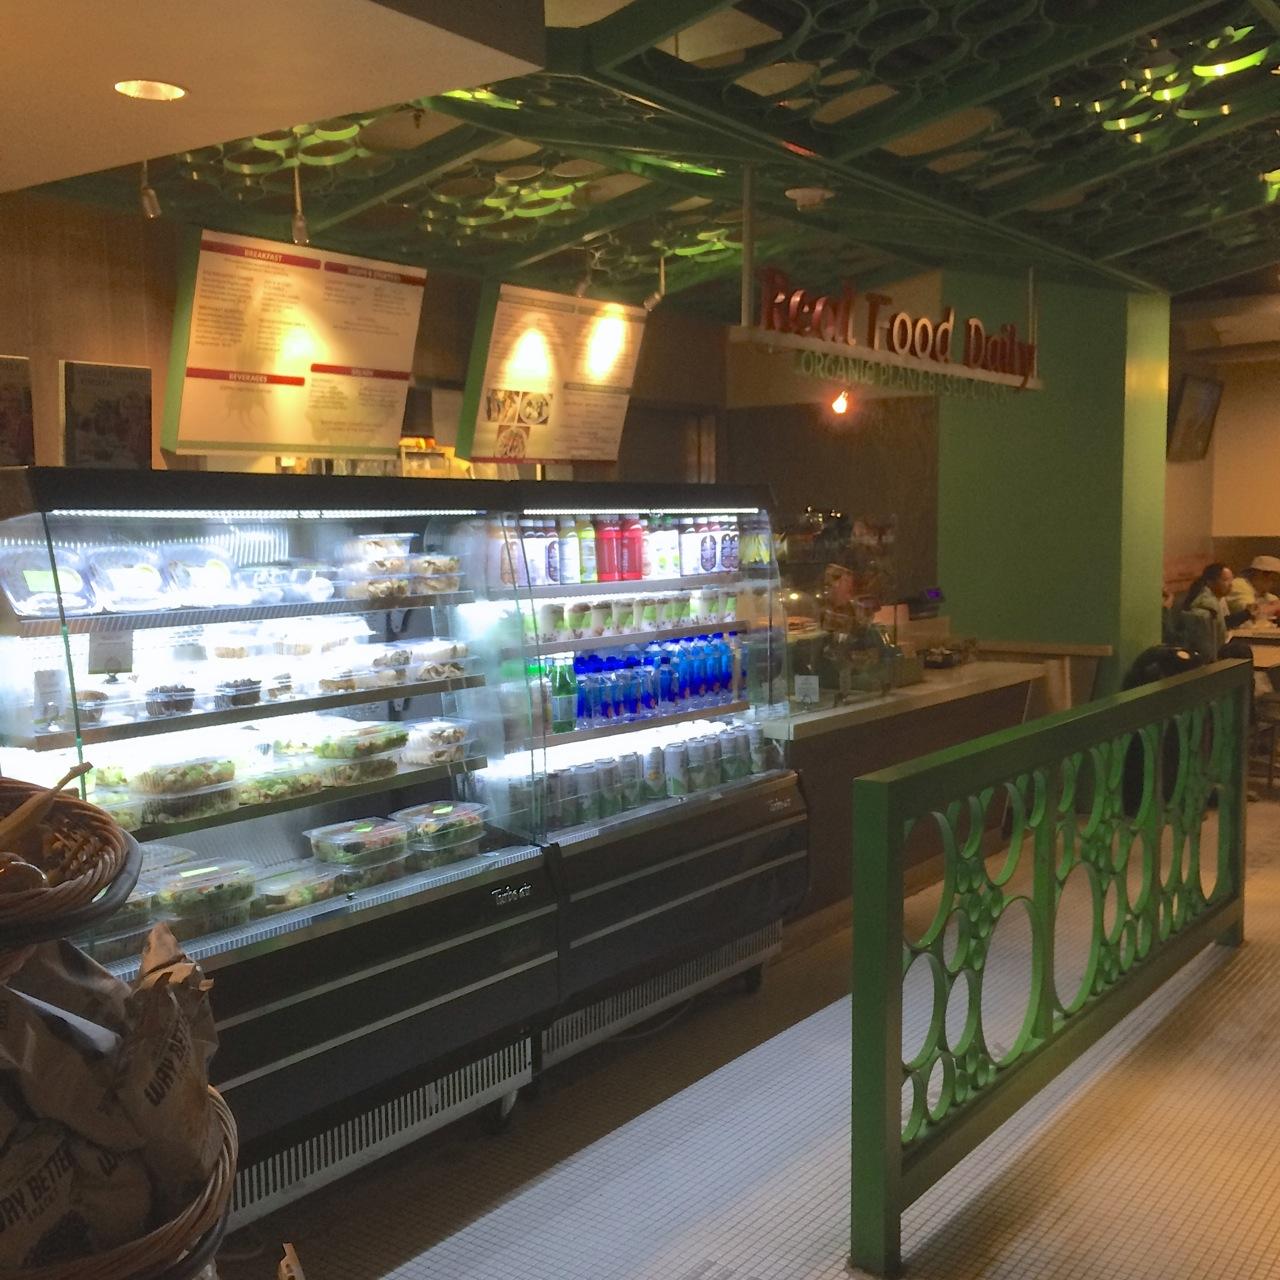 http://i1.wp.com/fatgayvegan.com/wp-content/uploads/2015/06/real-food-daily-LAX.jpg?fit=1280%2C1280